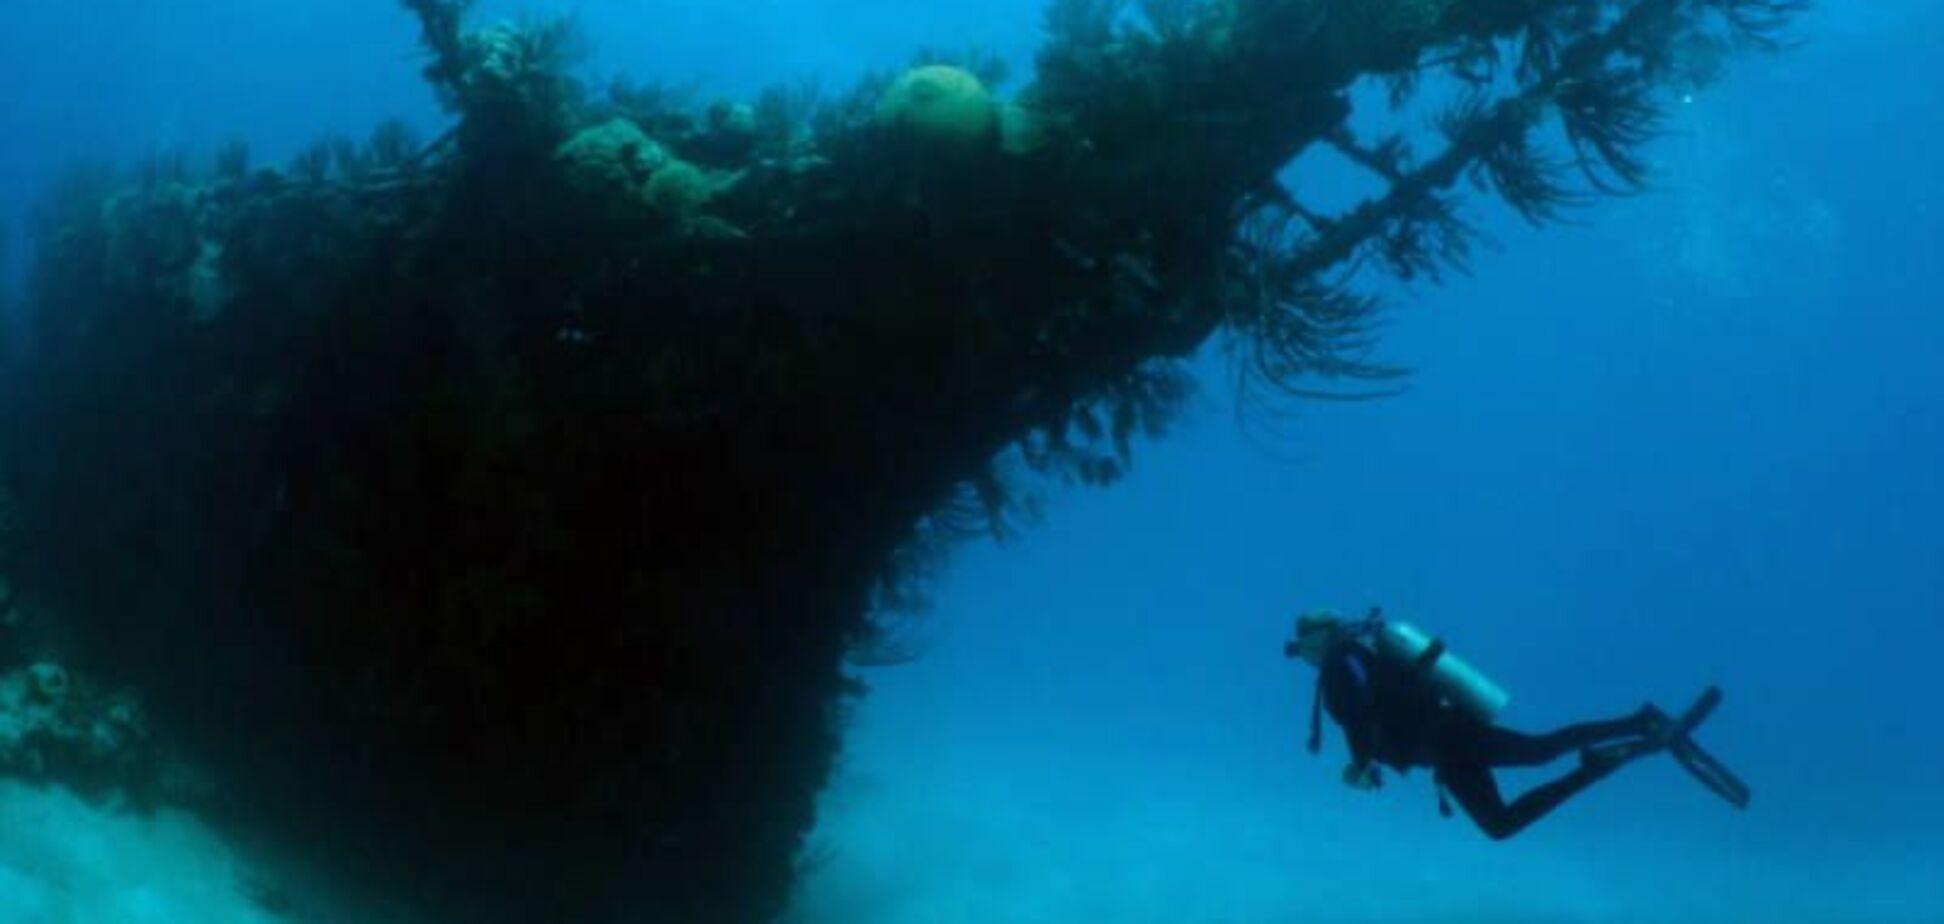 Запорожец нашел немецкий корабль на дне Днепра